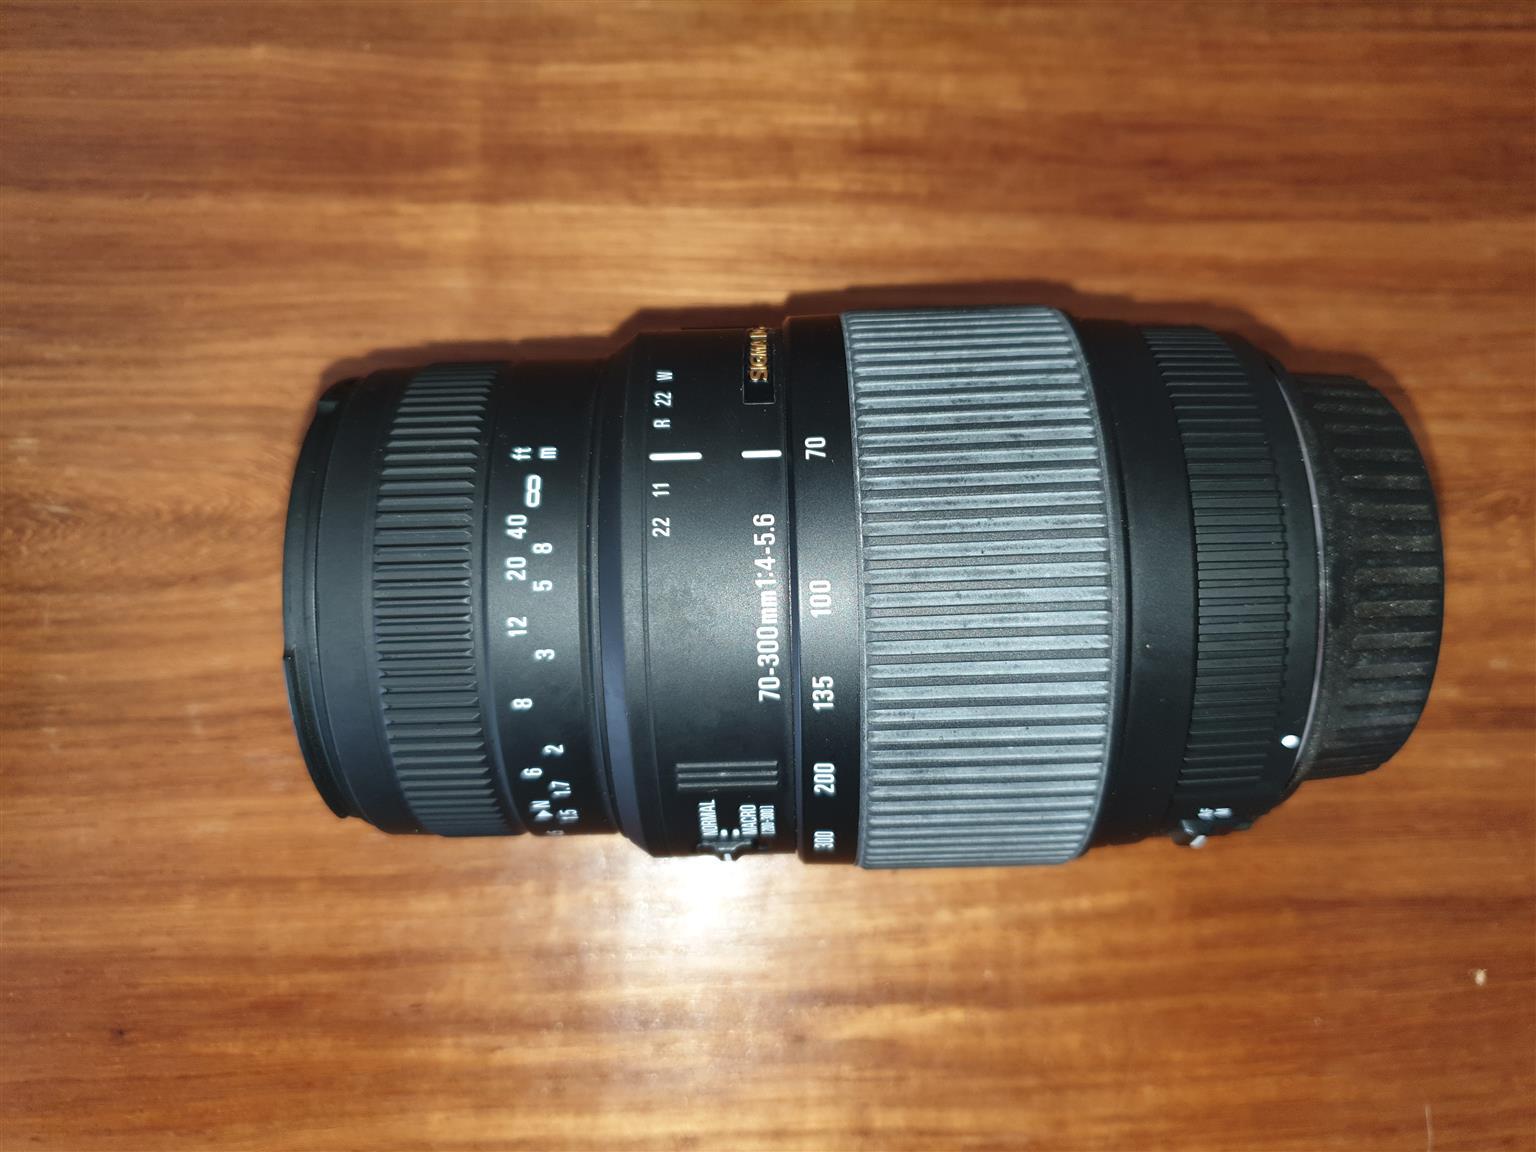 Canon 600D SLR Combo